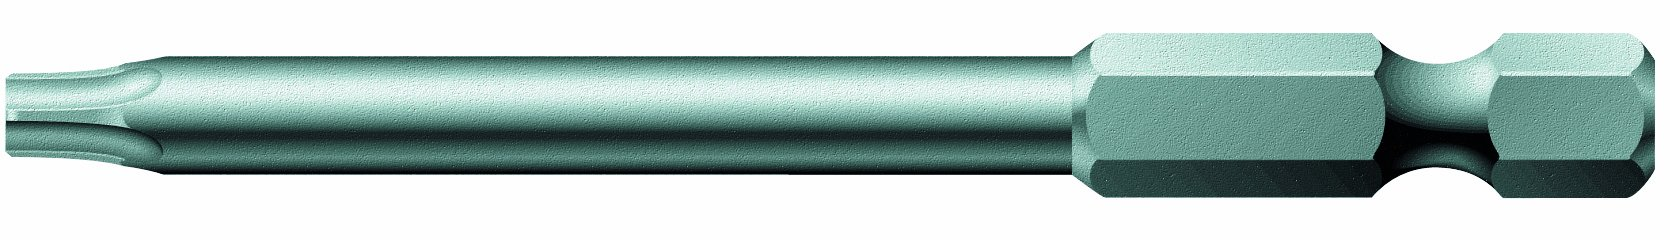 Wera Series 4 867/4 Z Sheet Metal Bit, TORX TX 25 x 70mm Blade, 1/4'' Drive (Pack of 10) by Wera